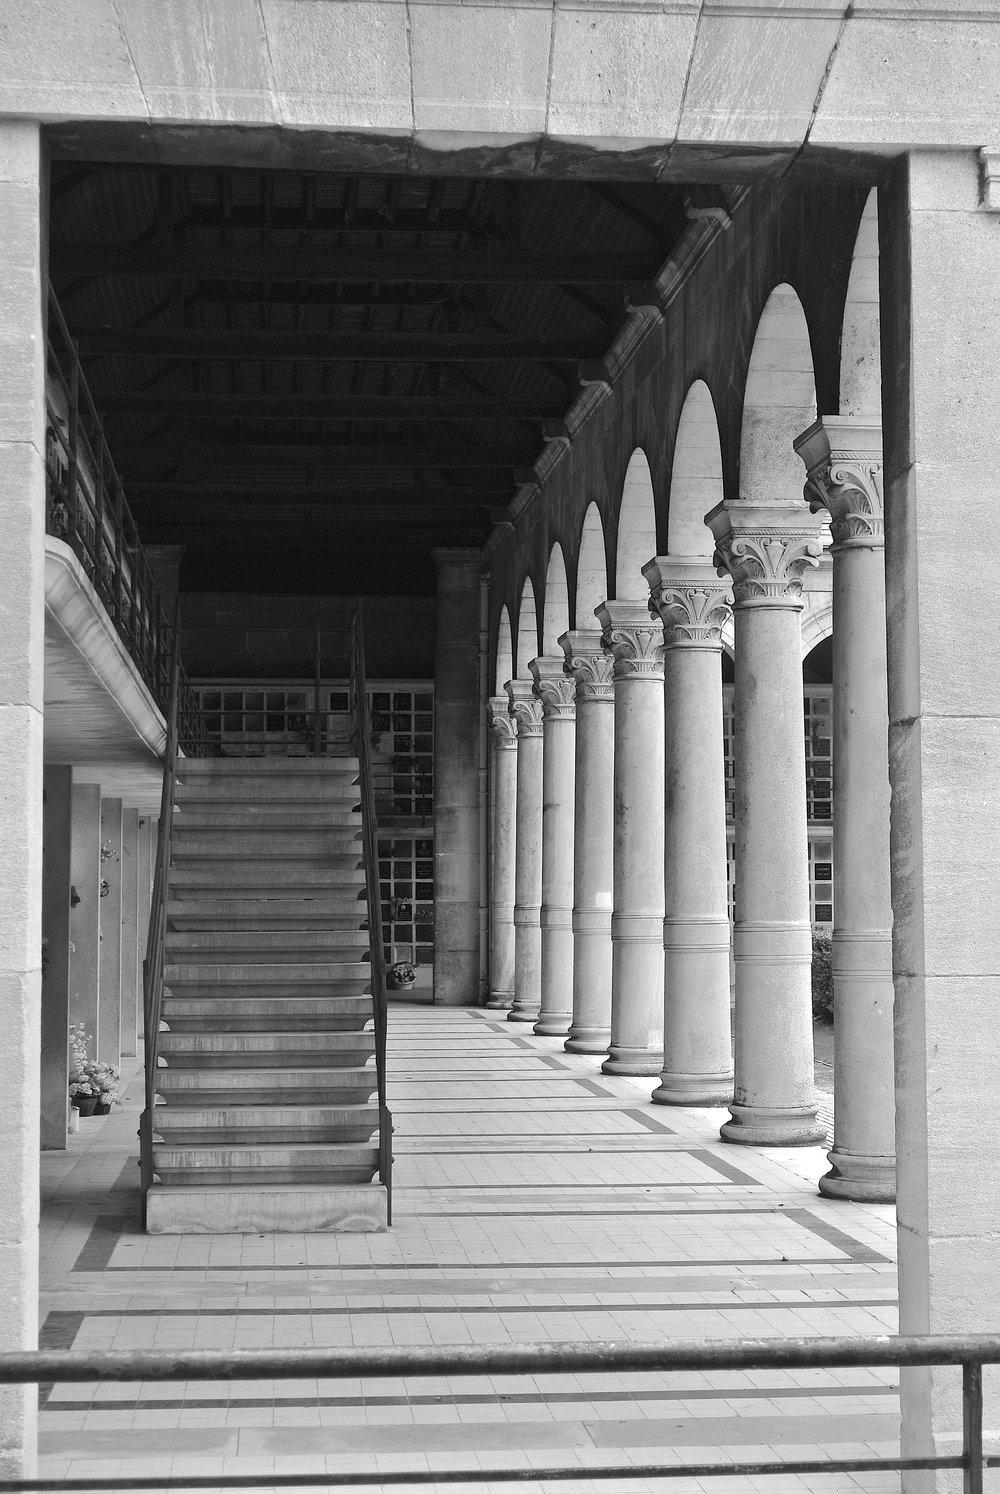 stairsandcolumns.JPG